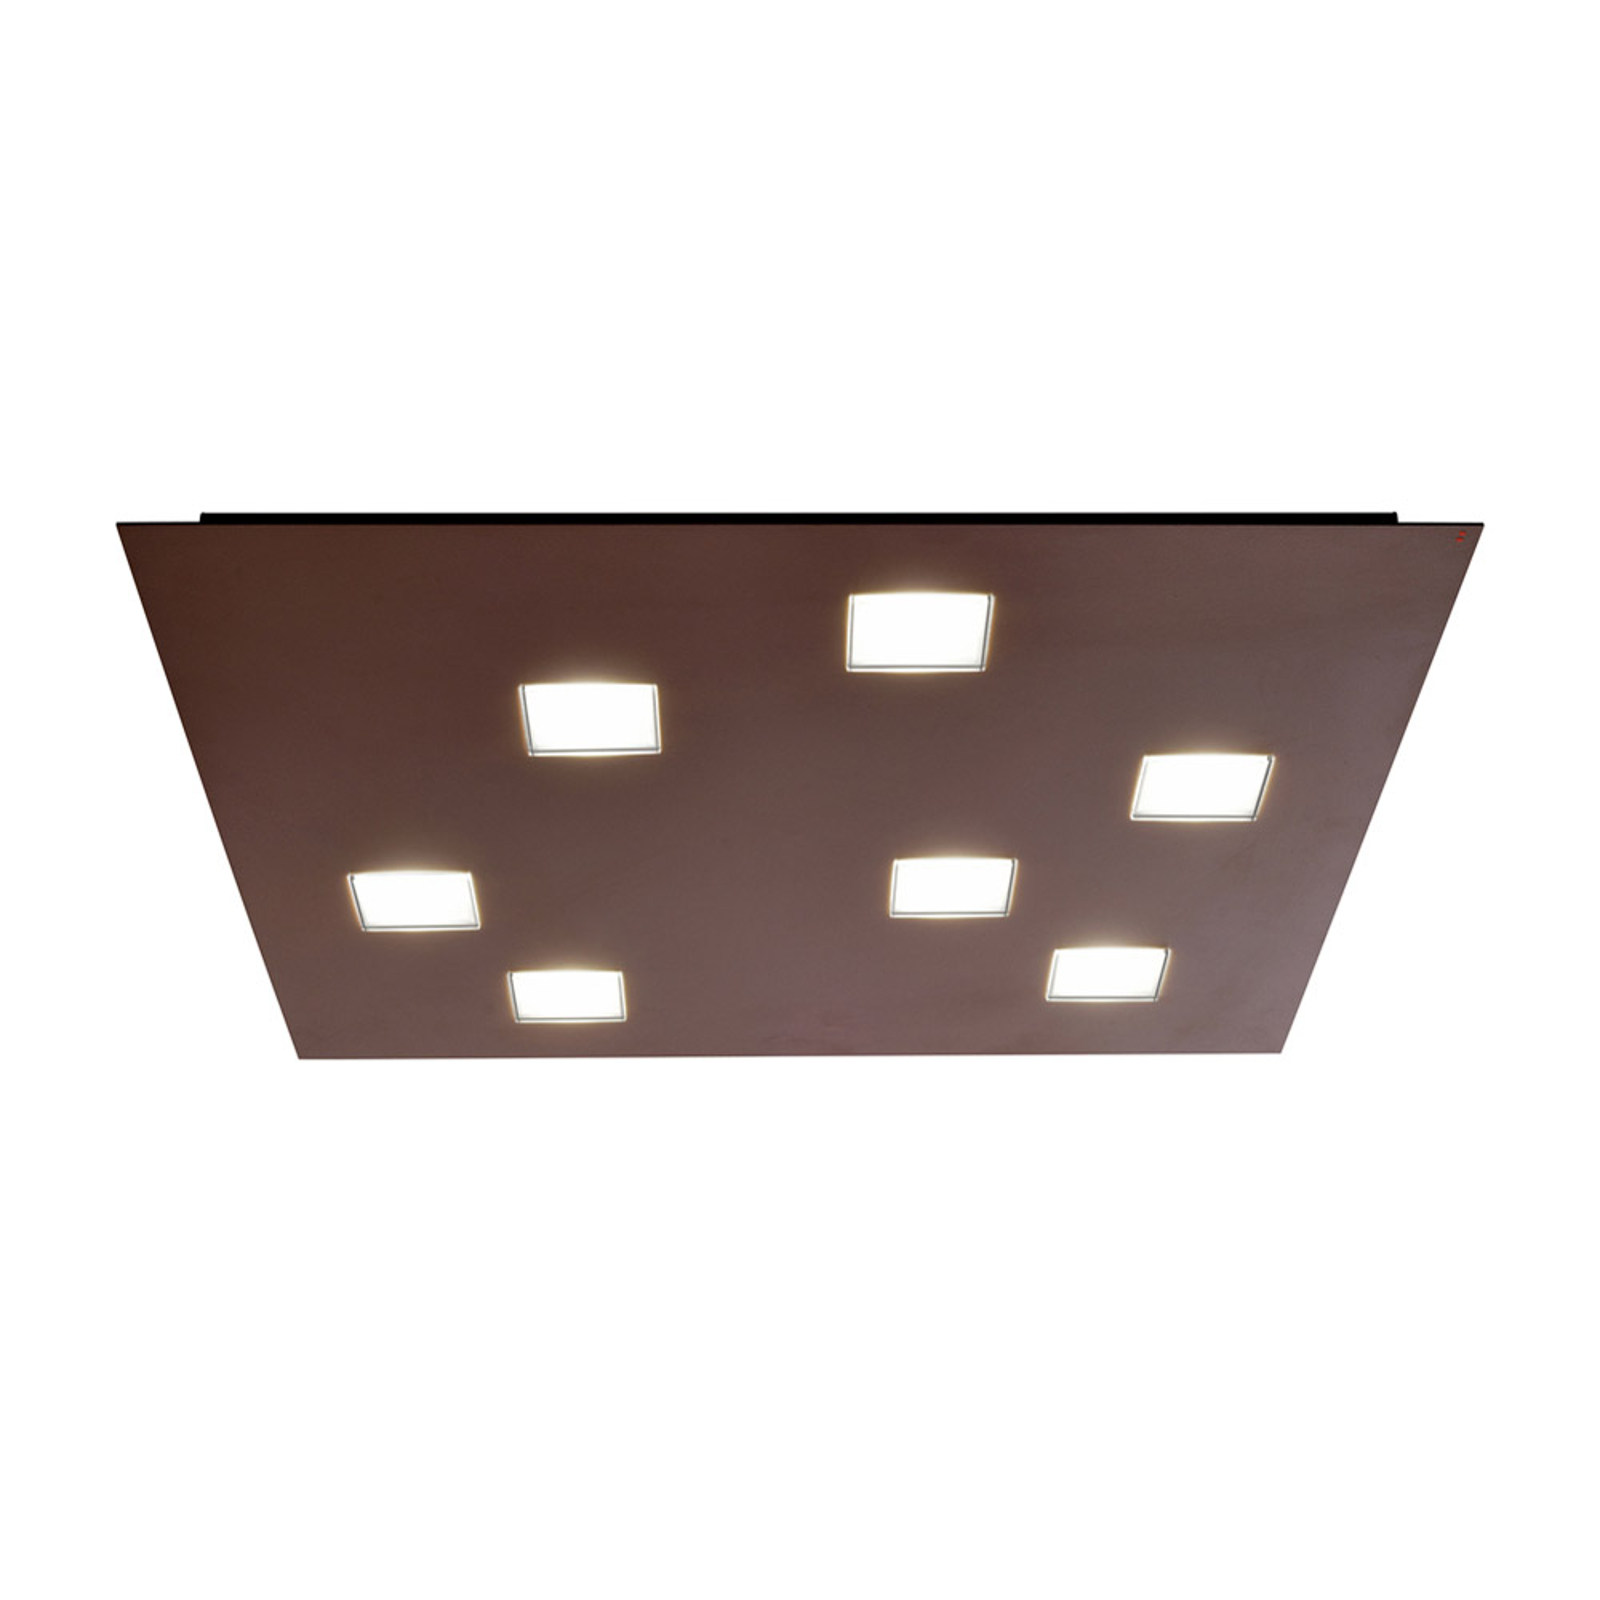 Lampa sufitowa LED Quarter, 7 LED, brązowa